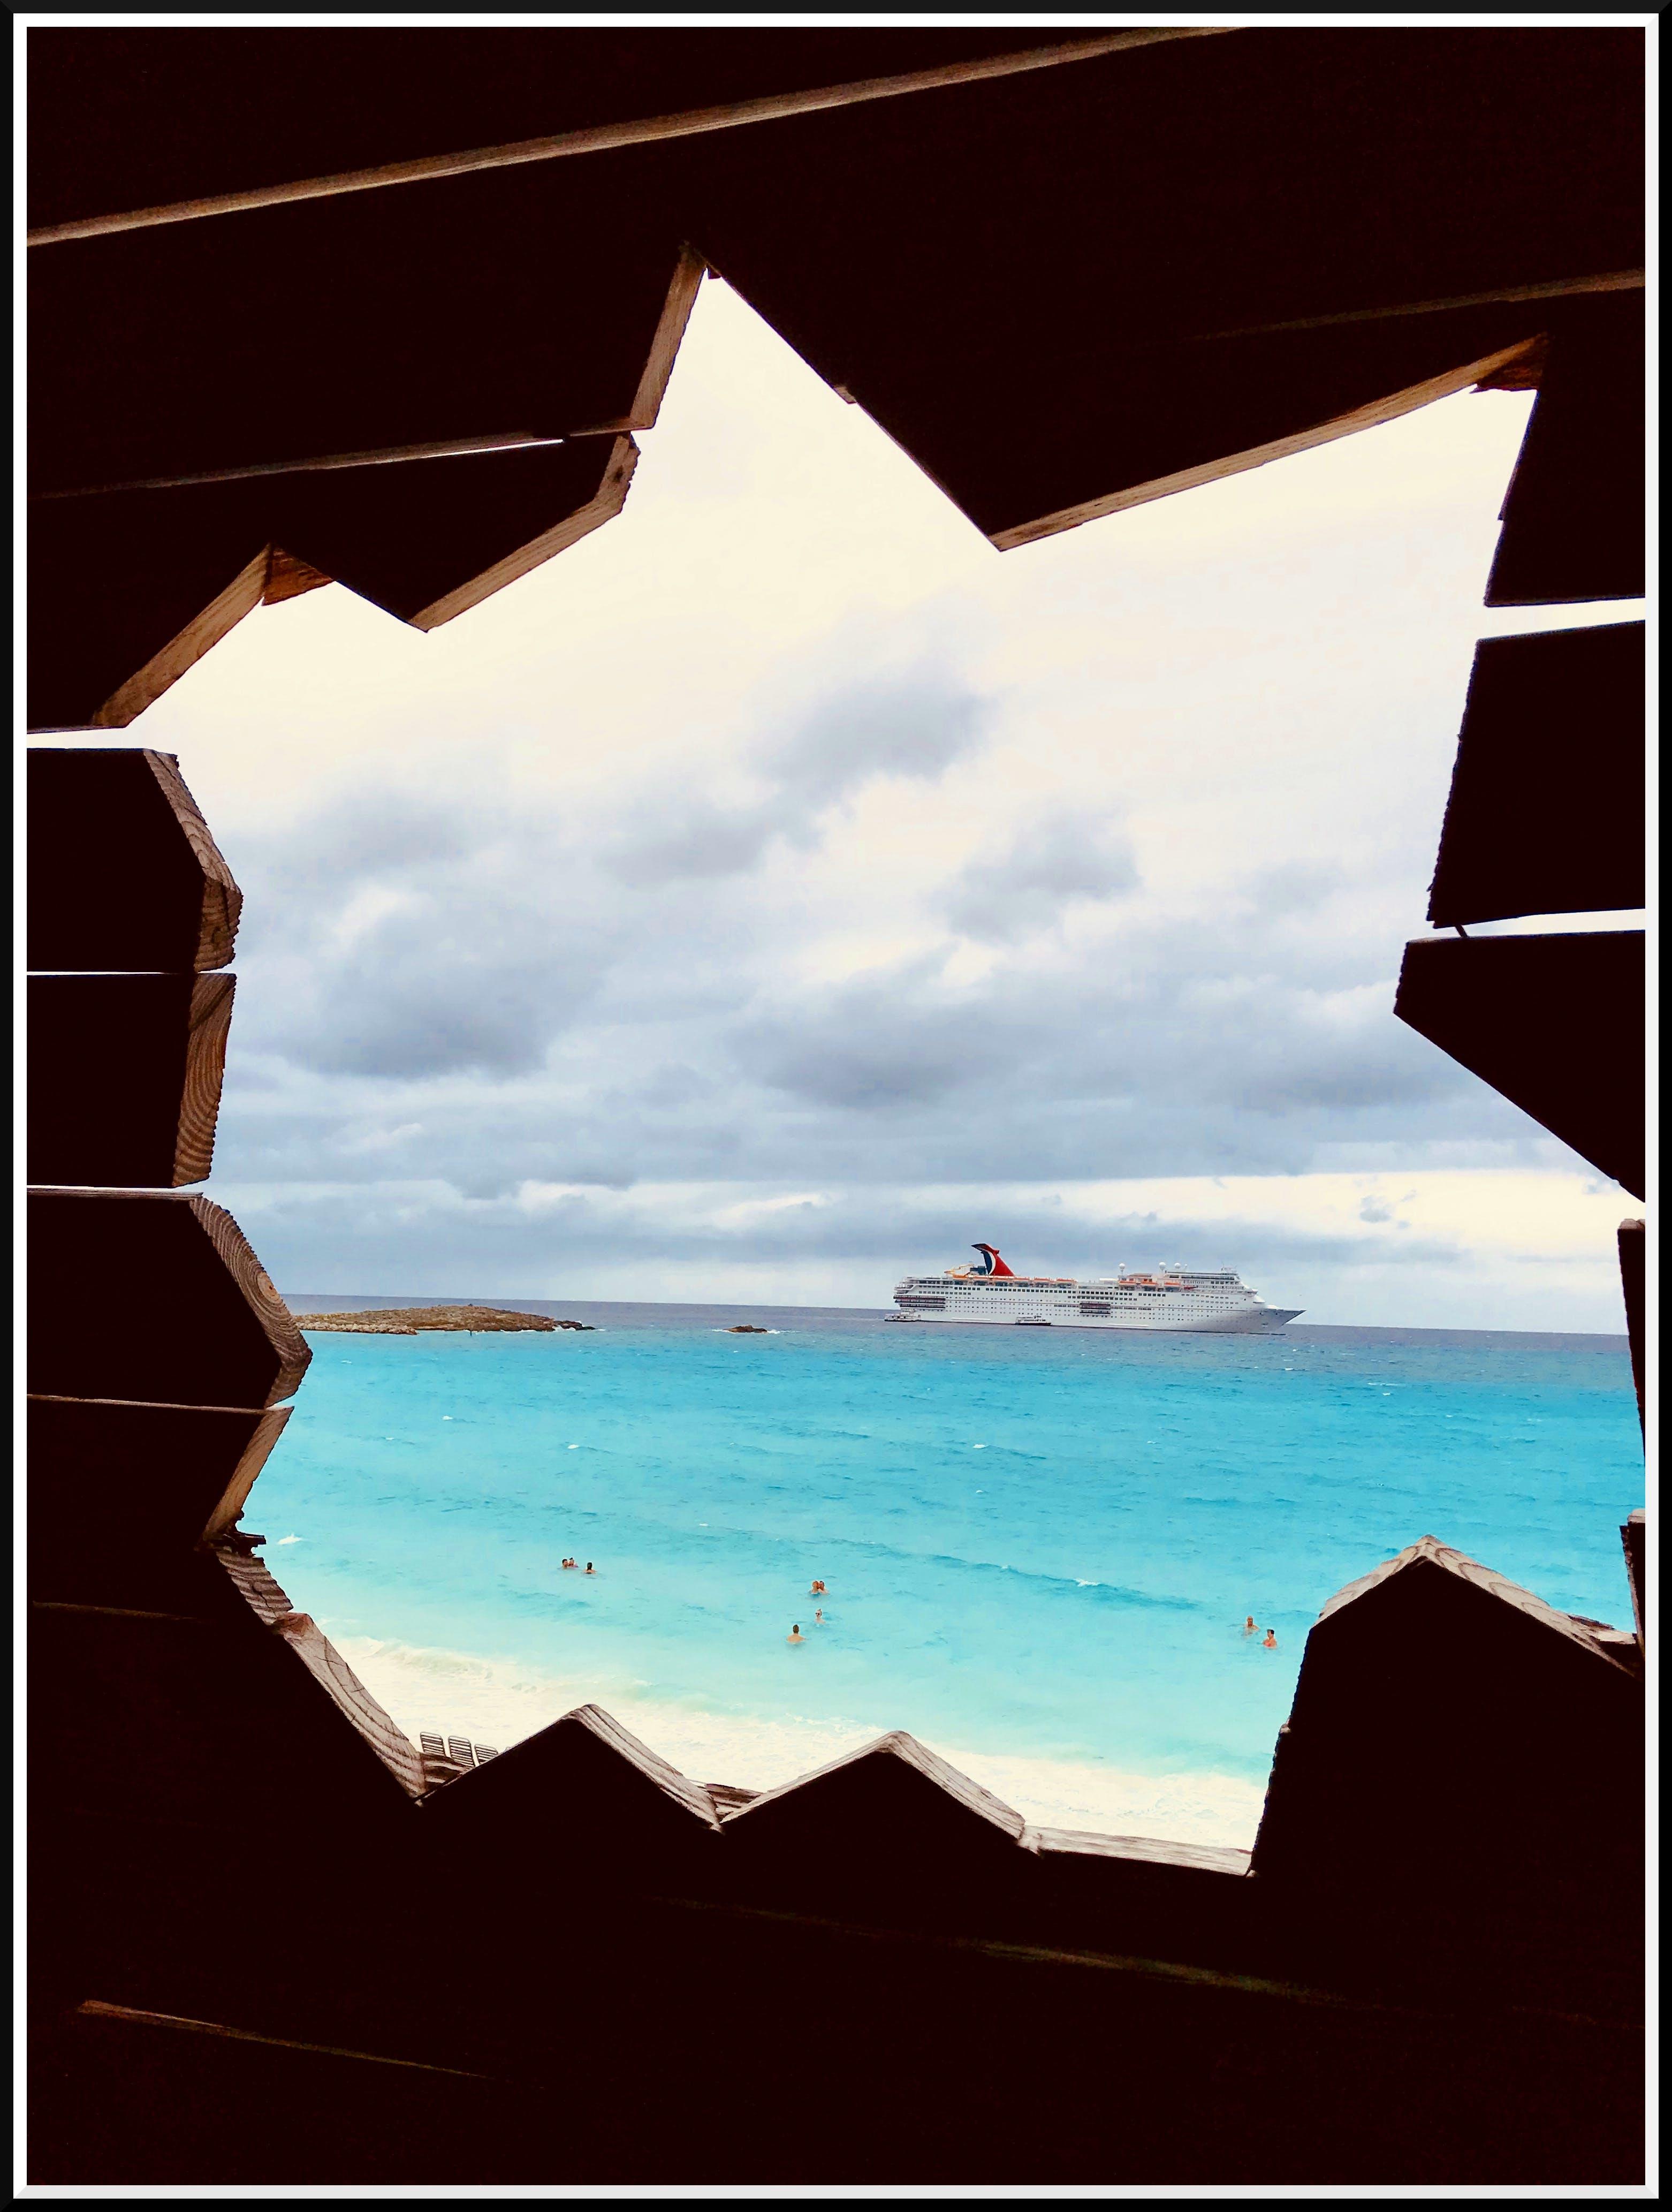 Free stock photo of cruise ship, frames, ocean